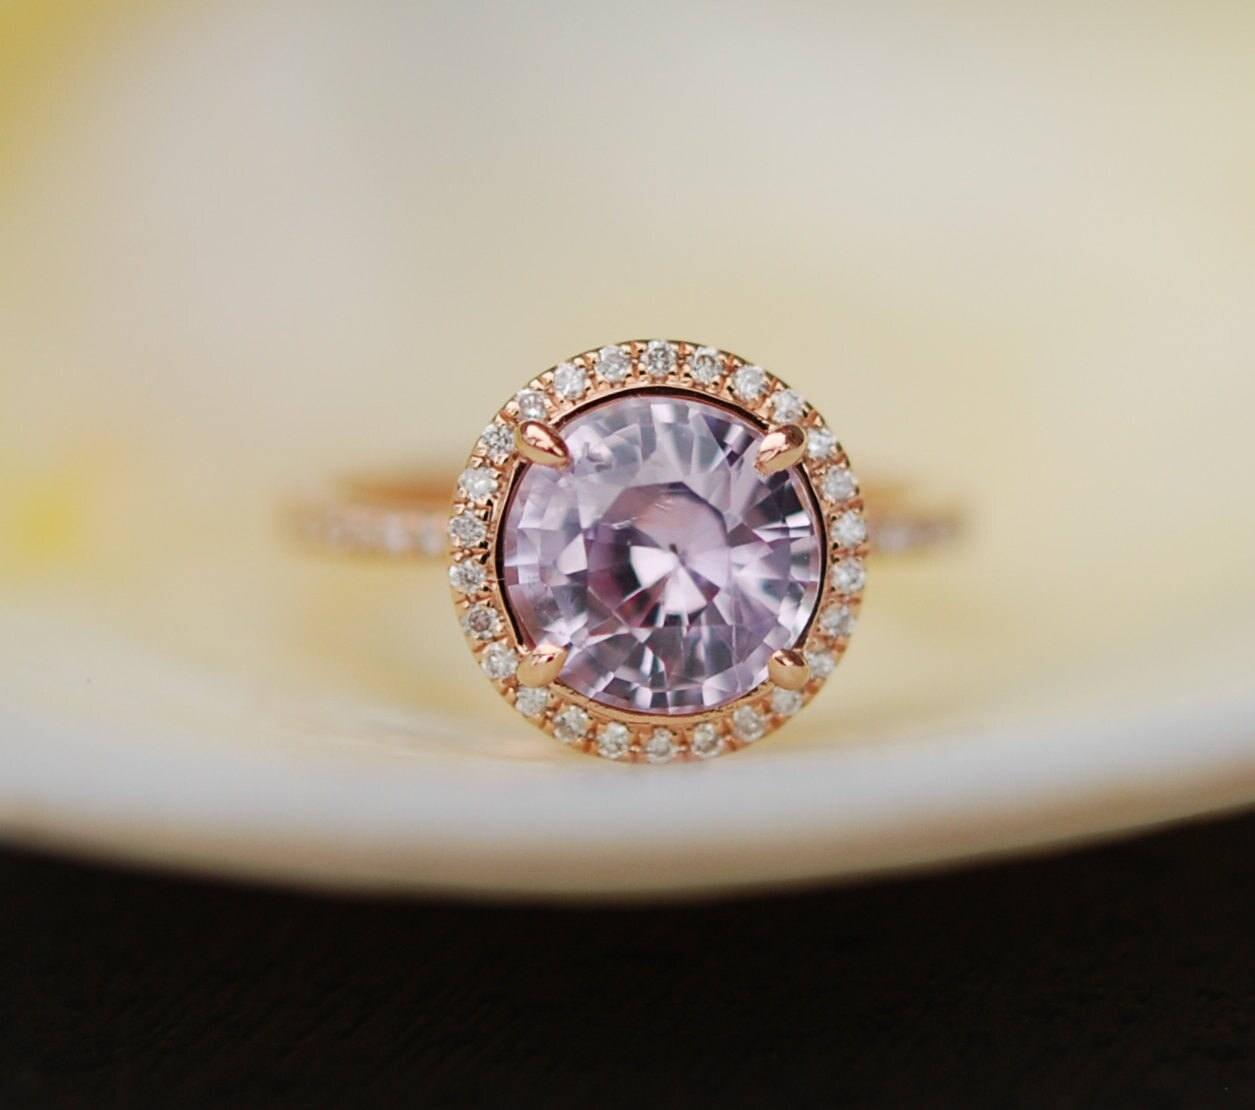 Rose Gold Engagement Ring Lavender Purple Mauve Sapphire. Eragon Wedding Rings. Malabar Rings. Bloodstone Wedding Rings. Puzzle Rings. Anchor Rings. Simplistic Rings. Romantic Wedding Rings. Traditional Rings